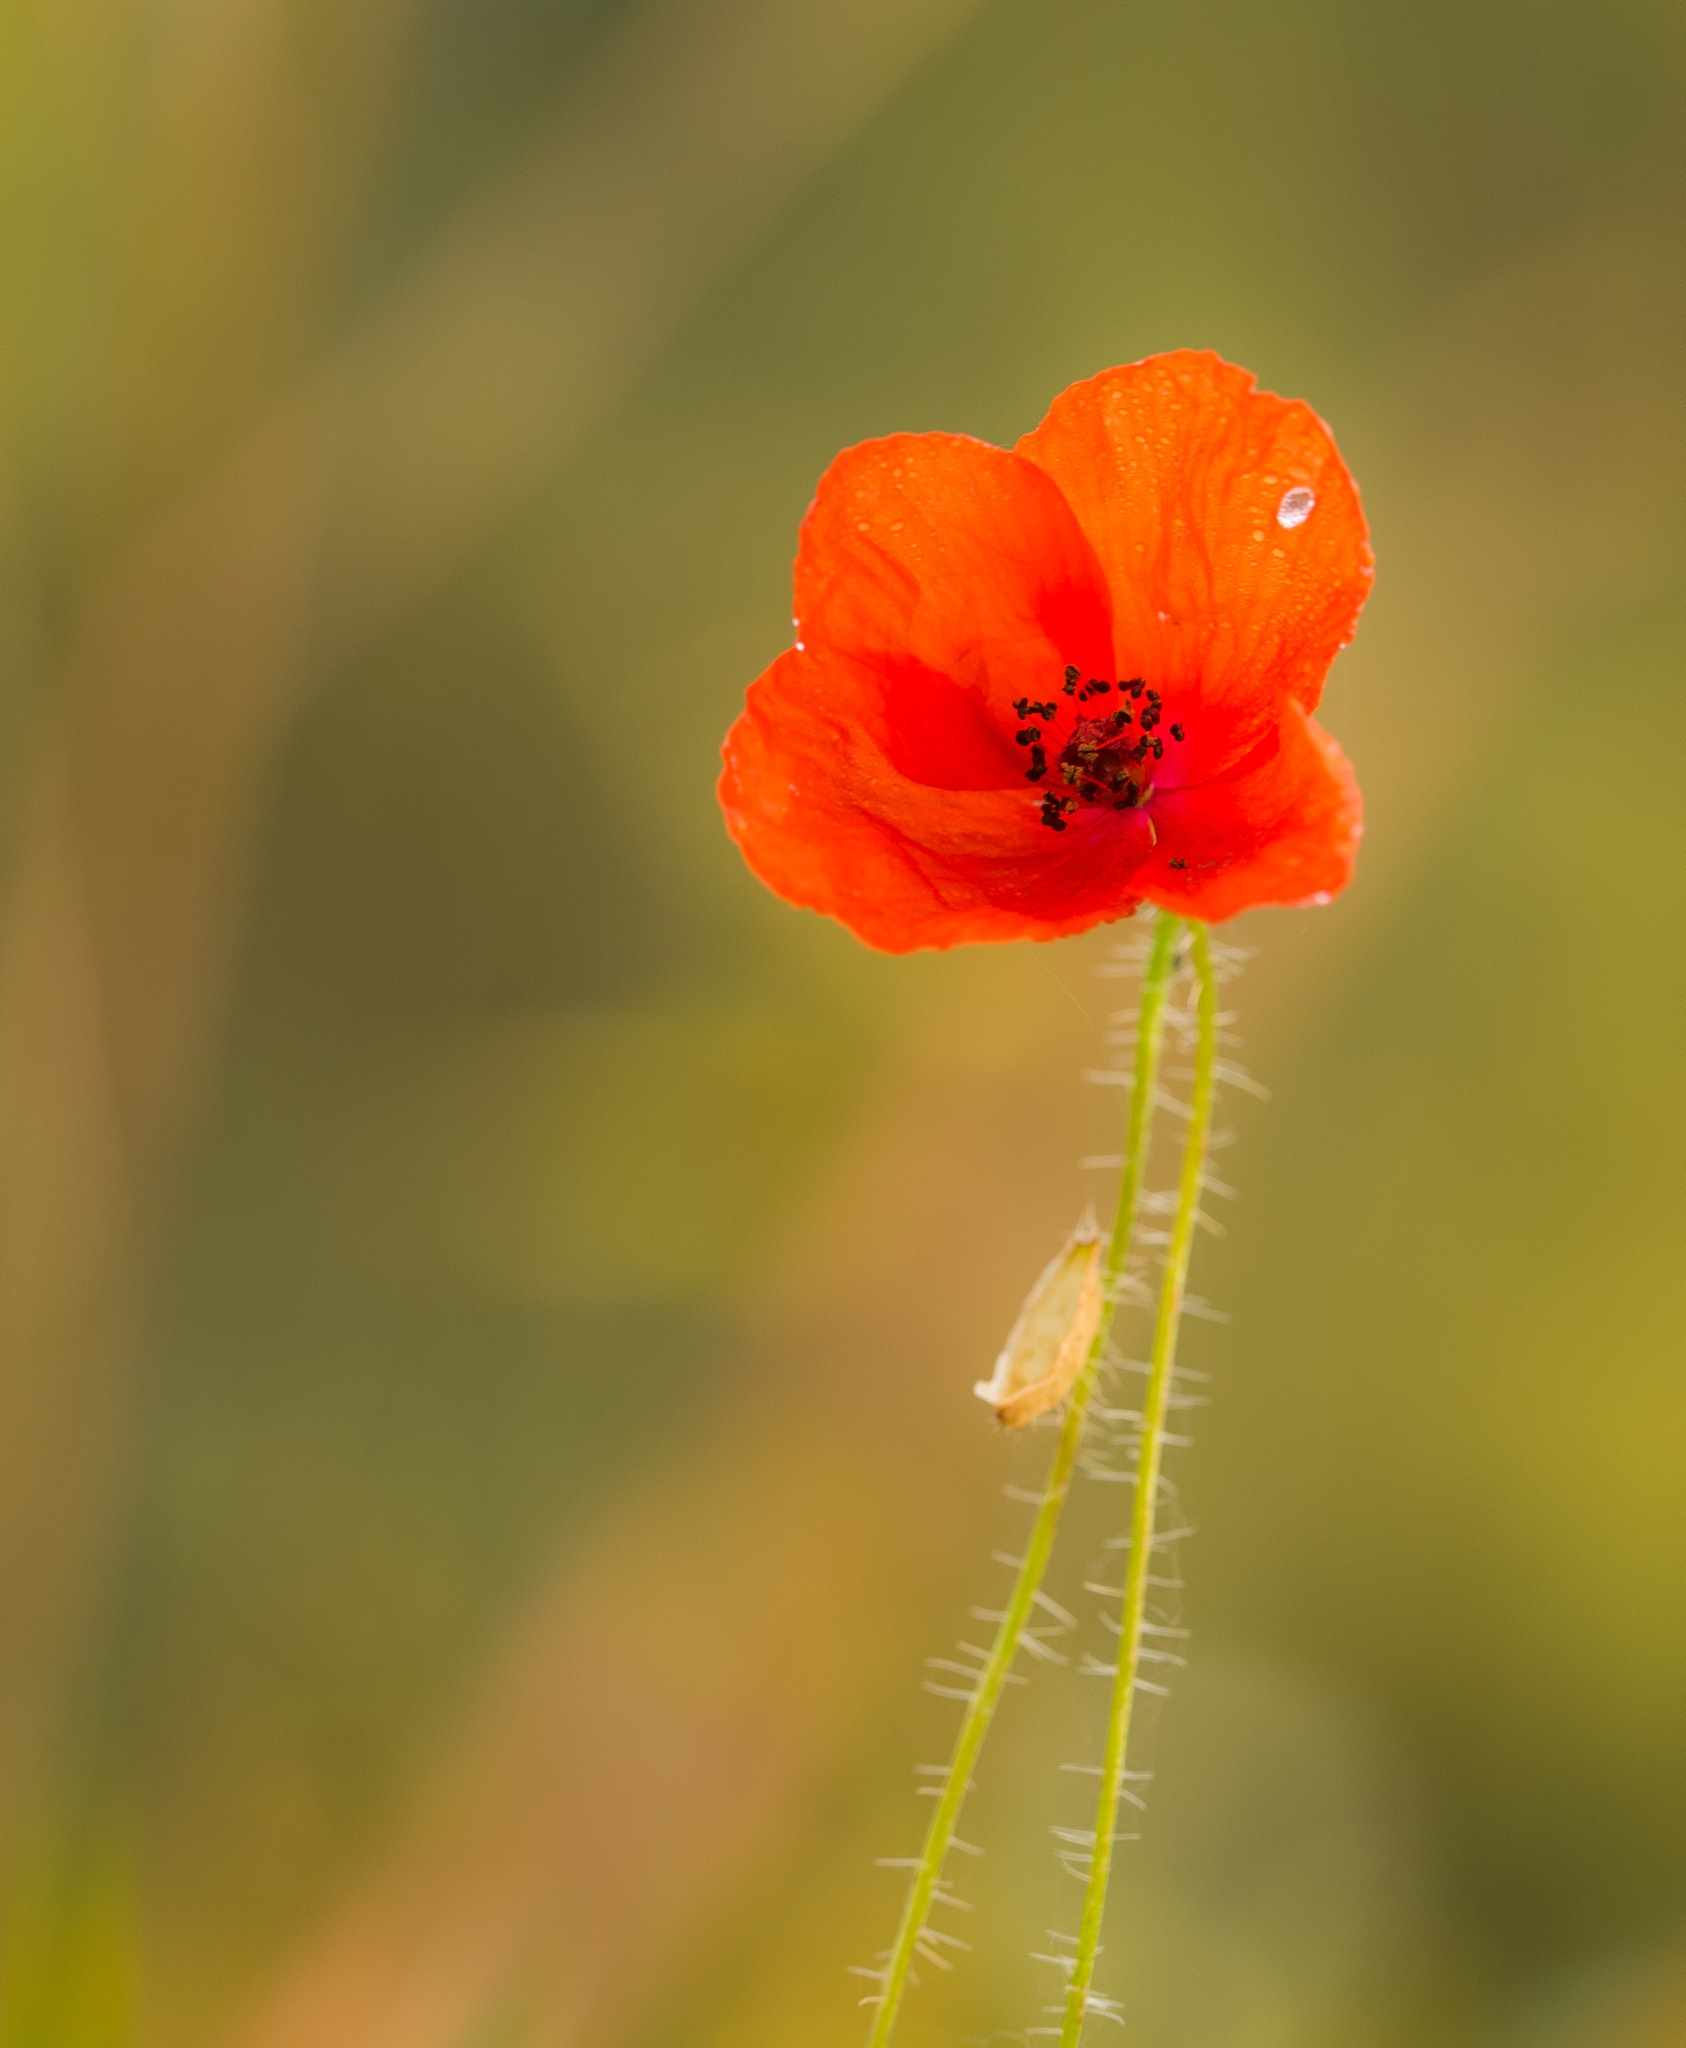 Poppy-up by Gilbert de Bruijn